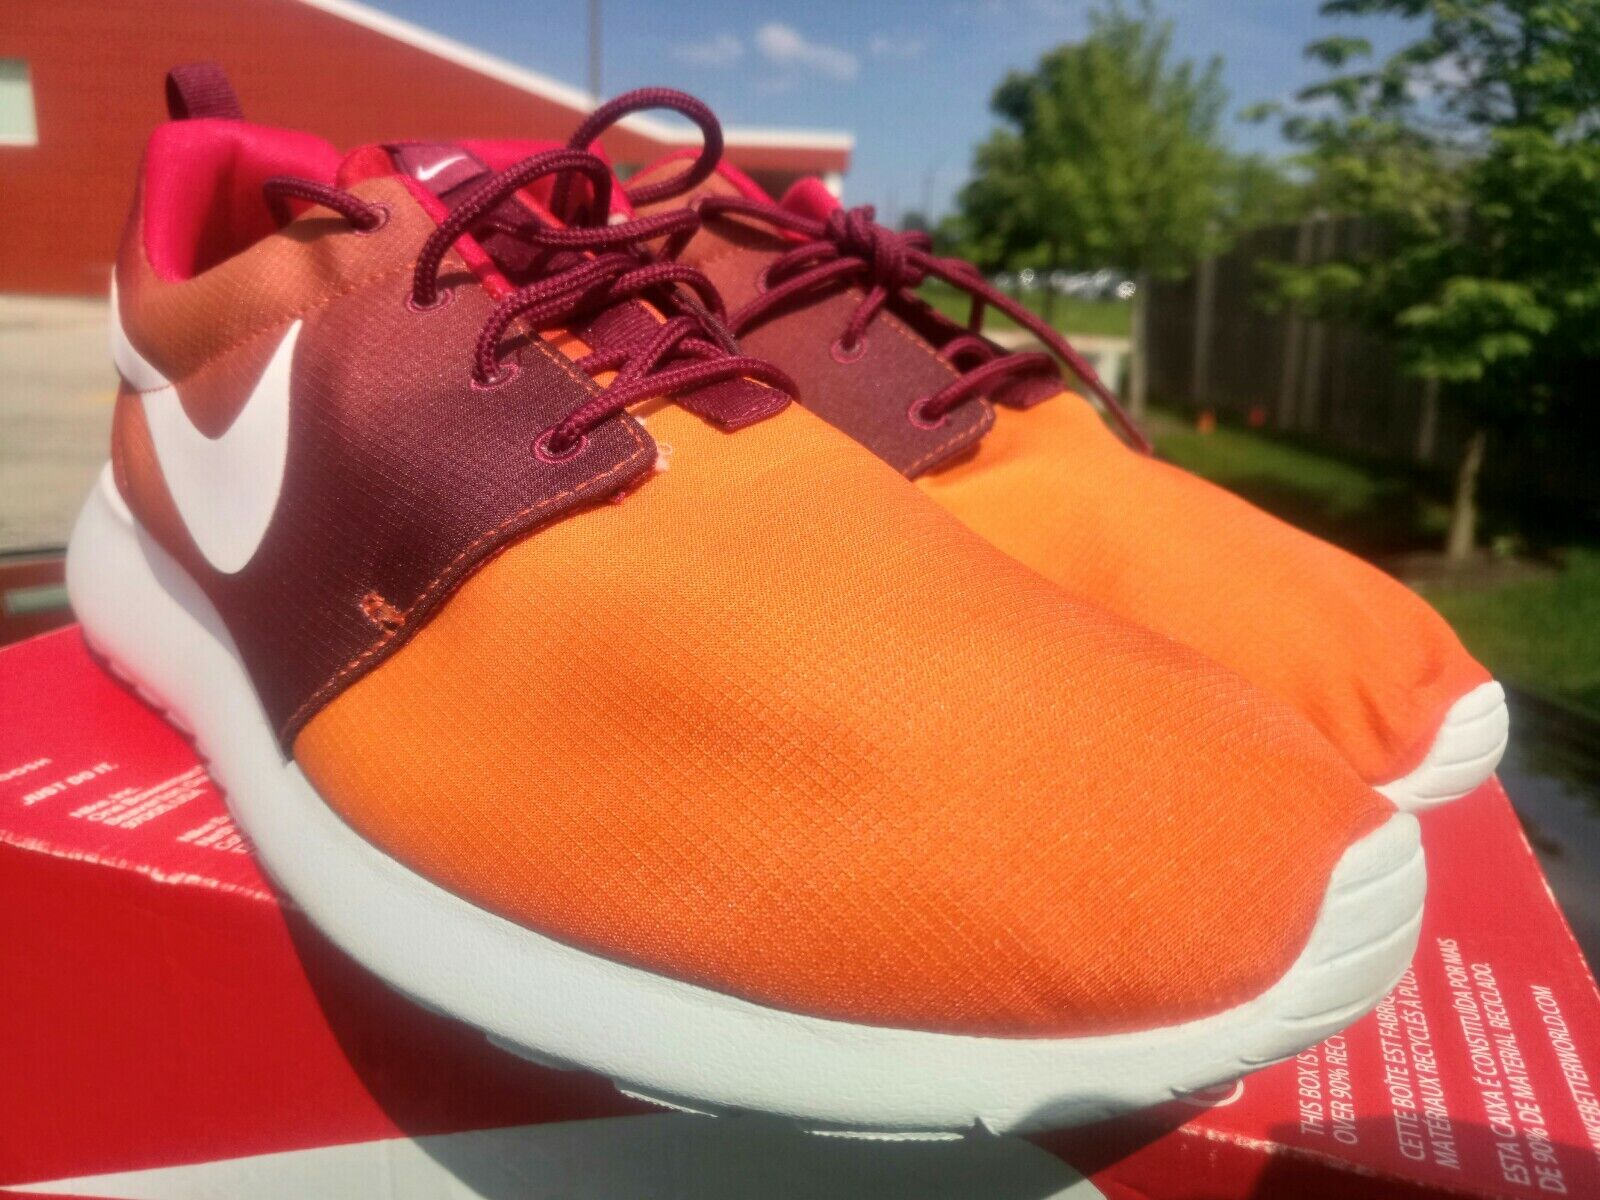 NIKE ROSHE ONE PRINT MEN& 039;S SIZE 13 orange White 655206 816 BRAND NEW shoes